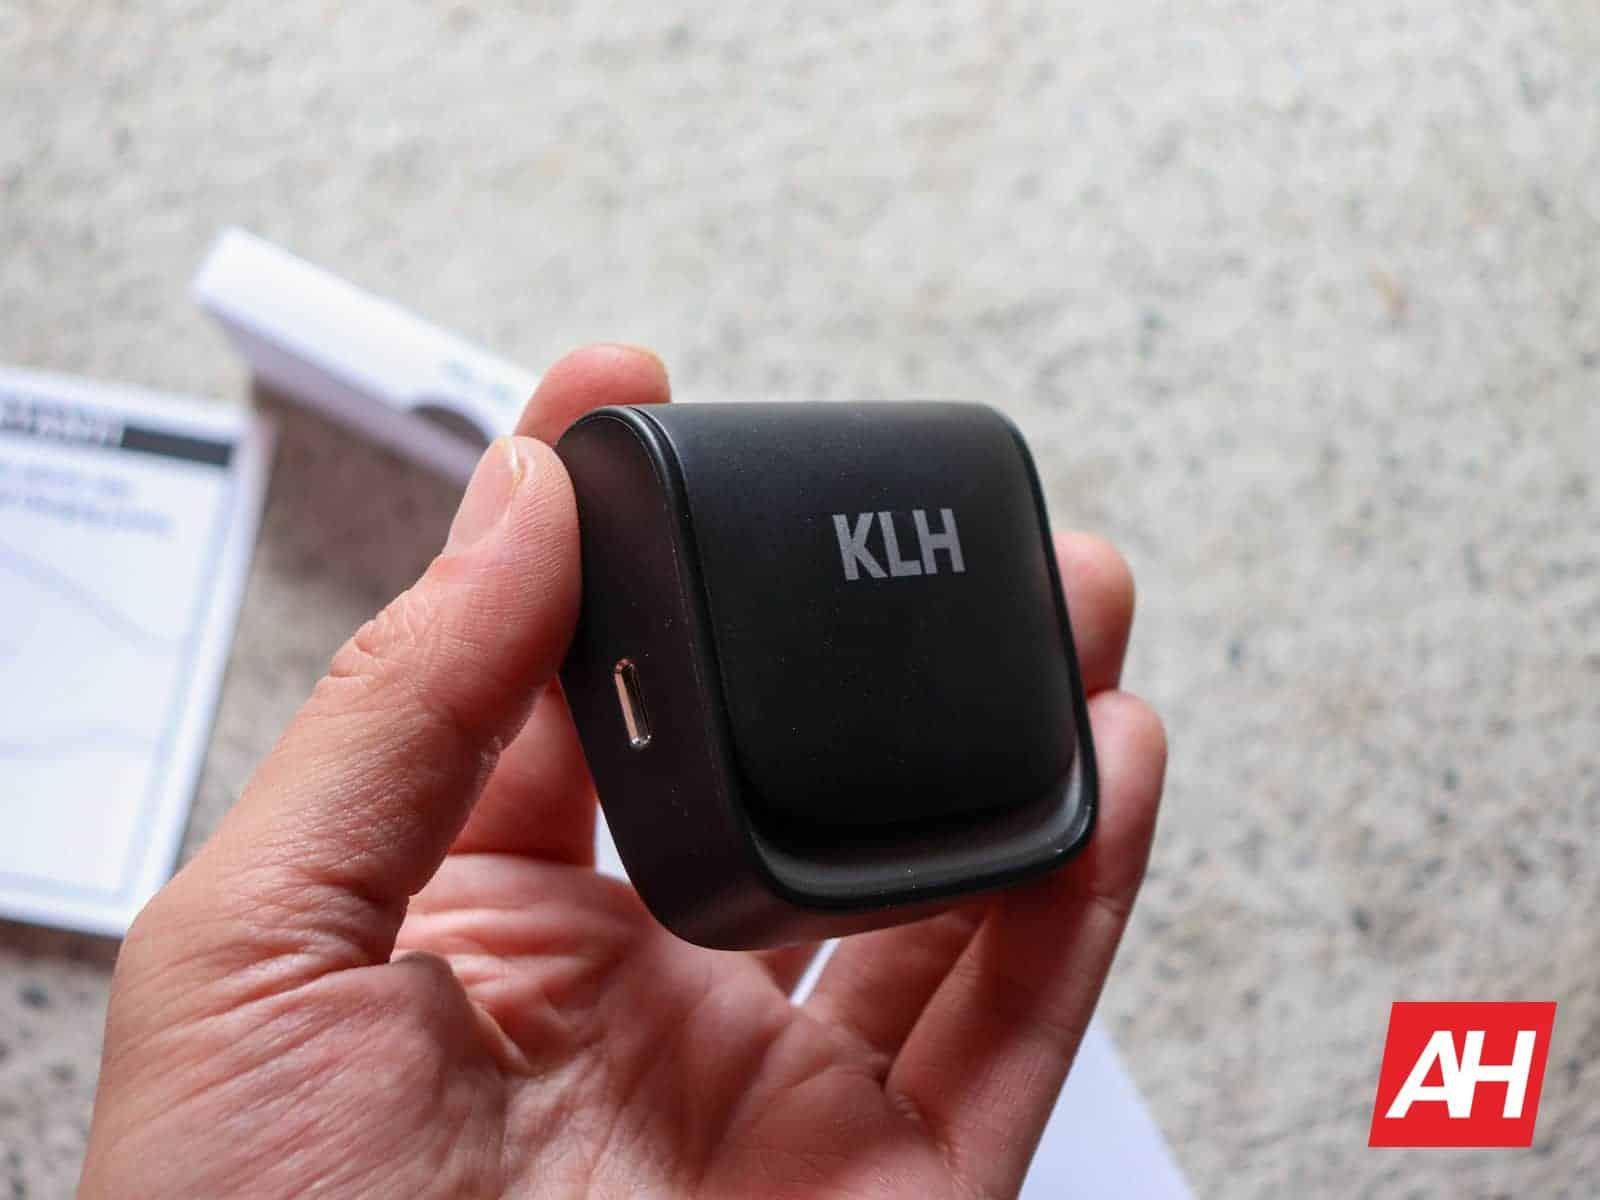 01 2 KLH Fusion Review hardware DG AH 2021